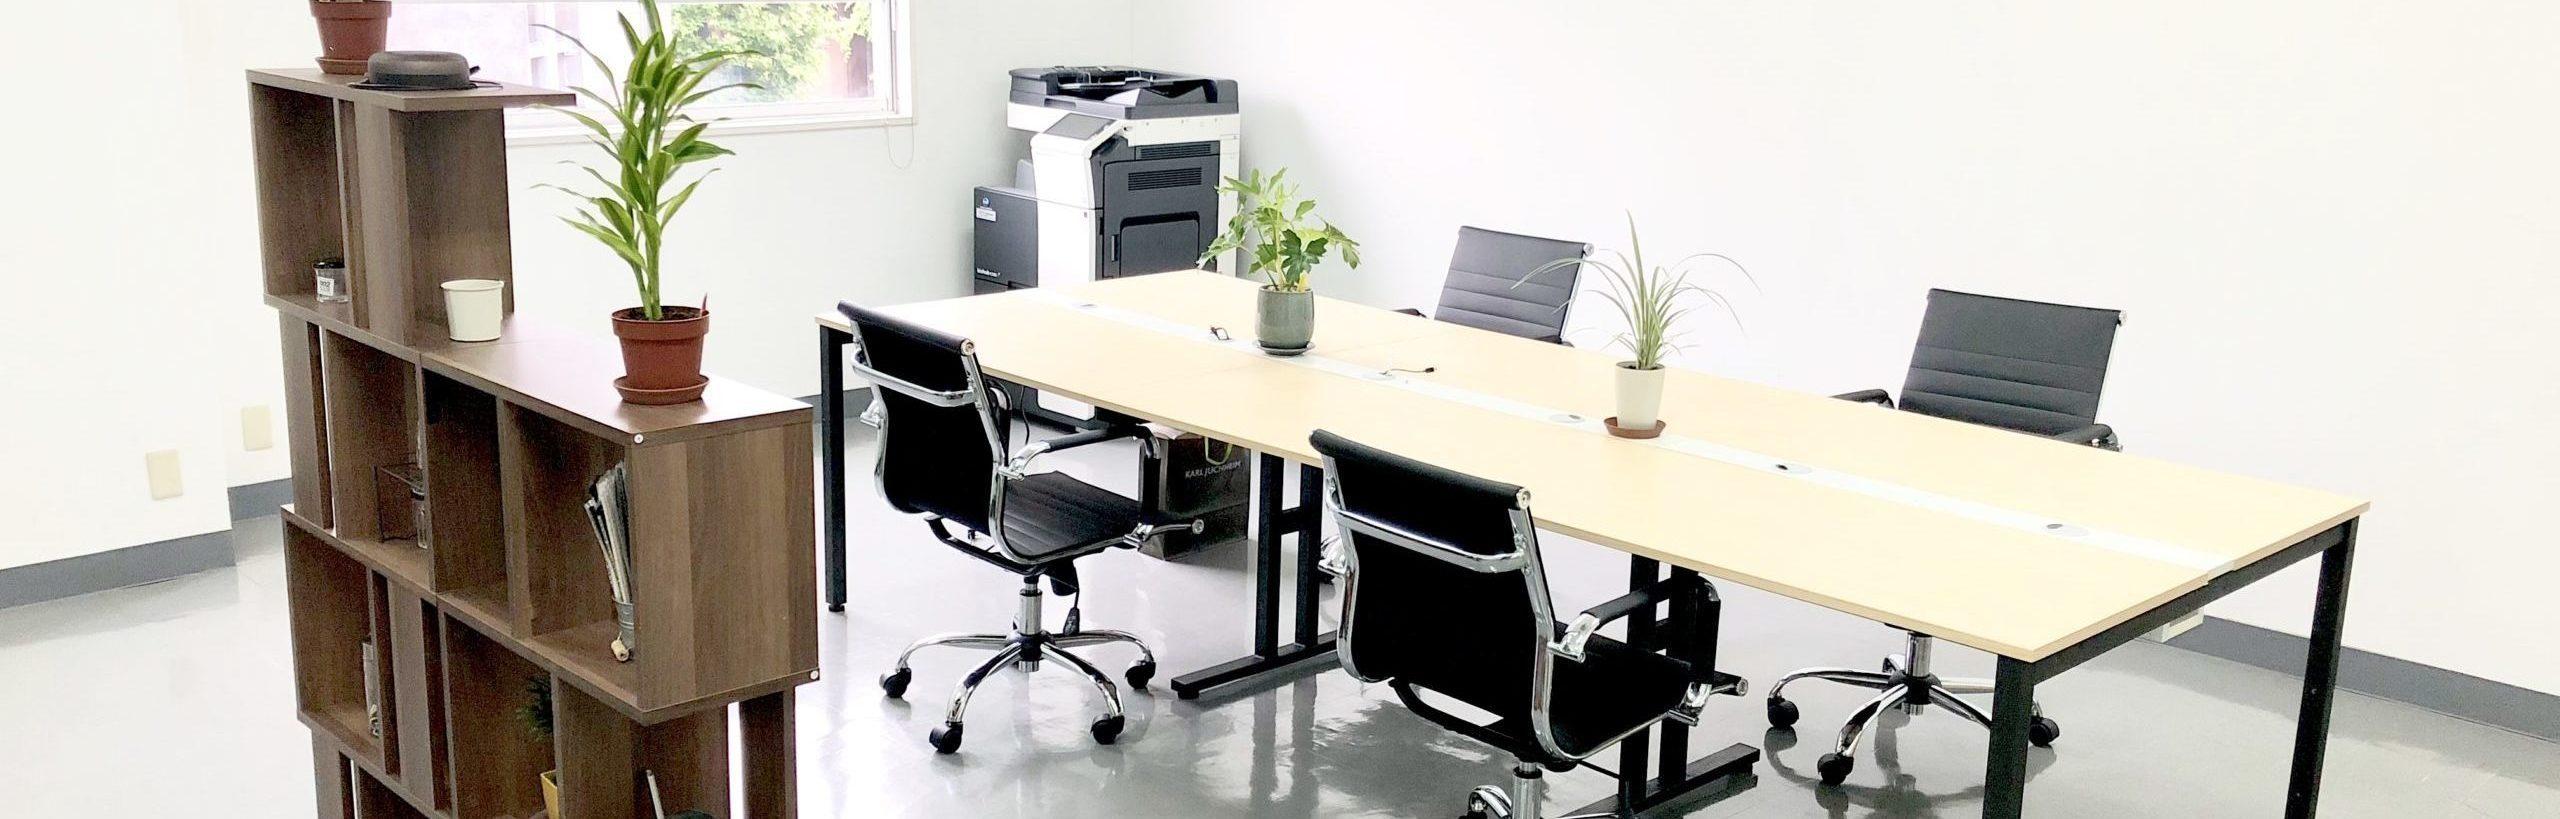 事務所の所在